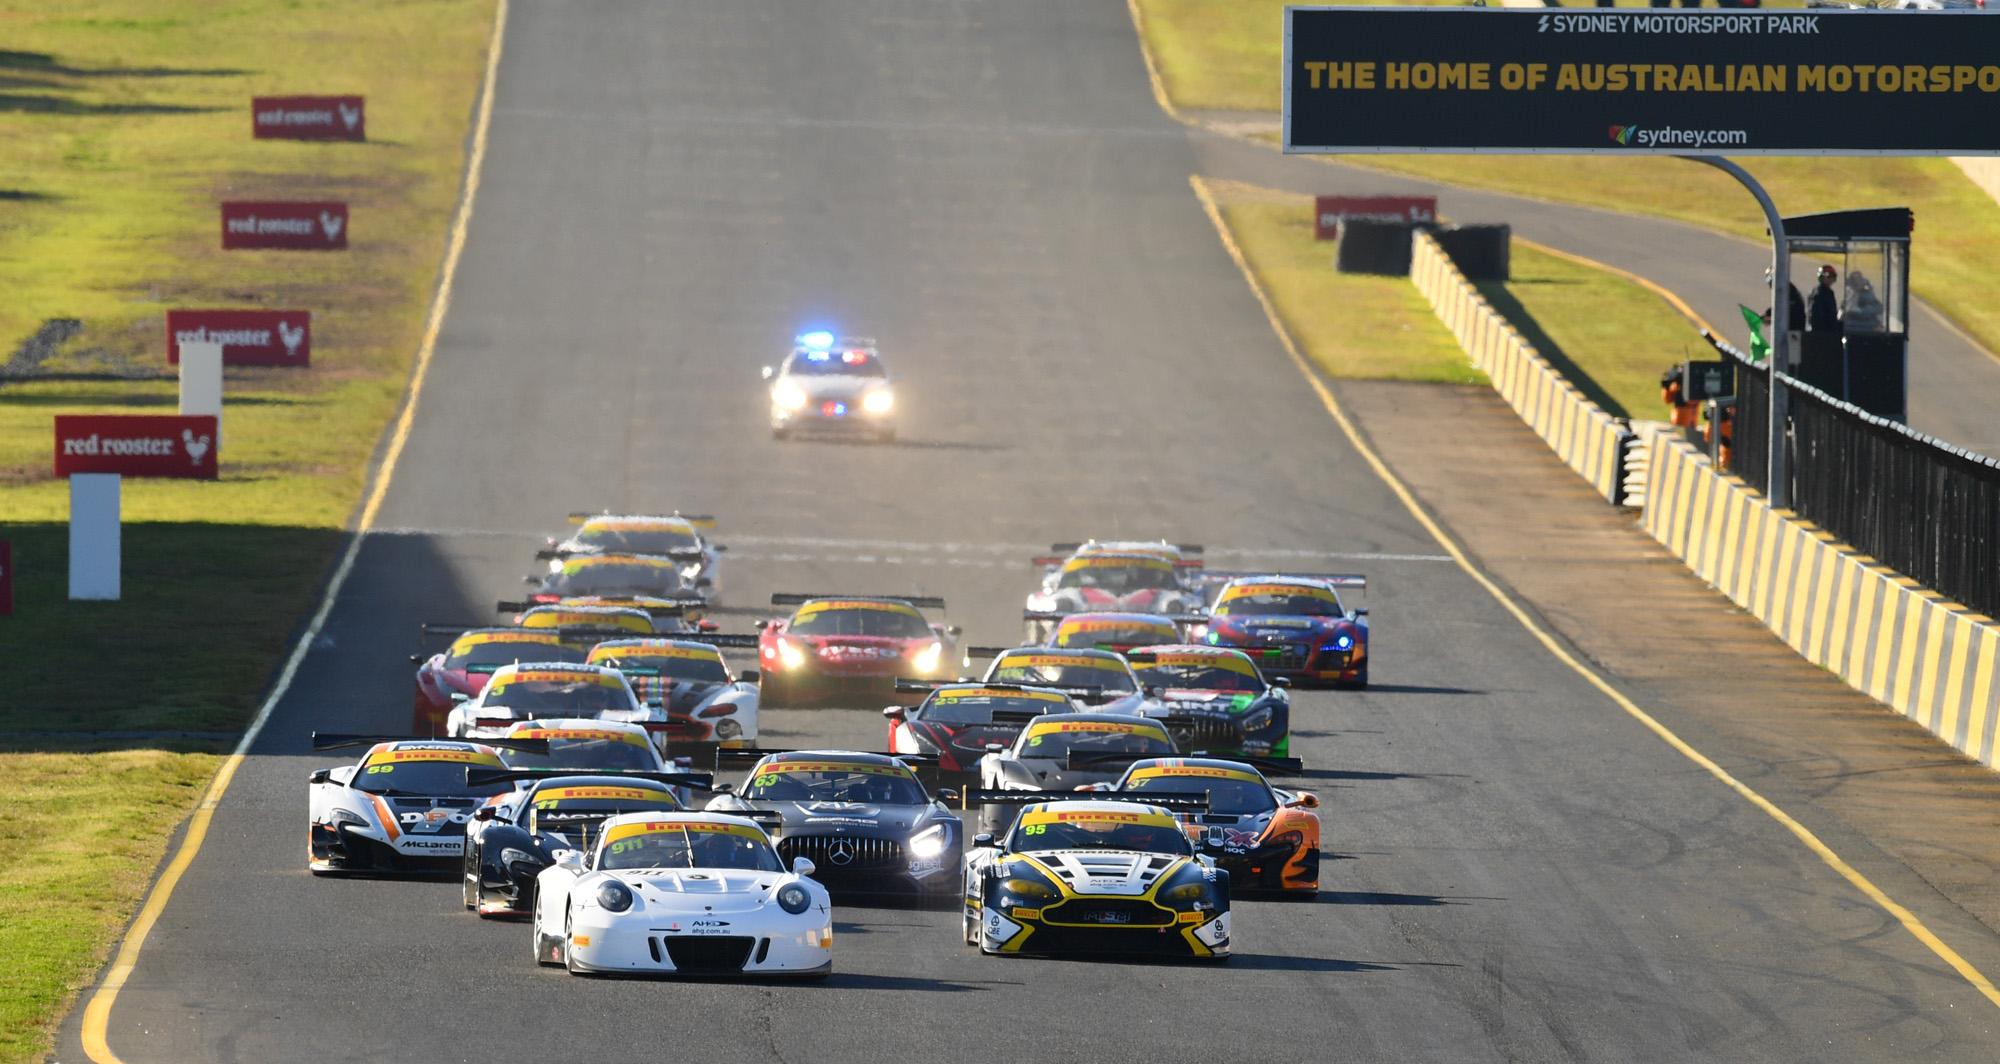 Sydney Motorsport Park 501